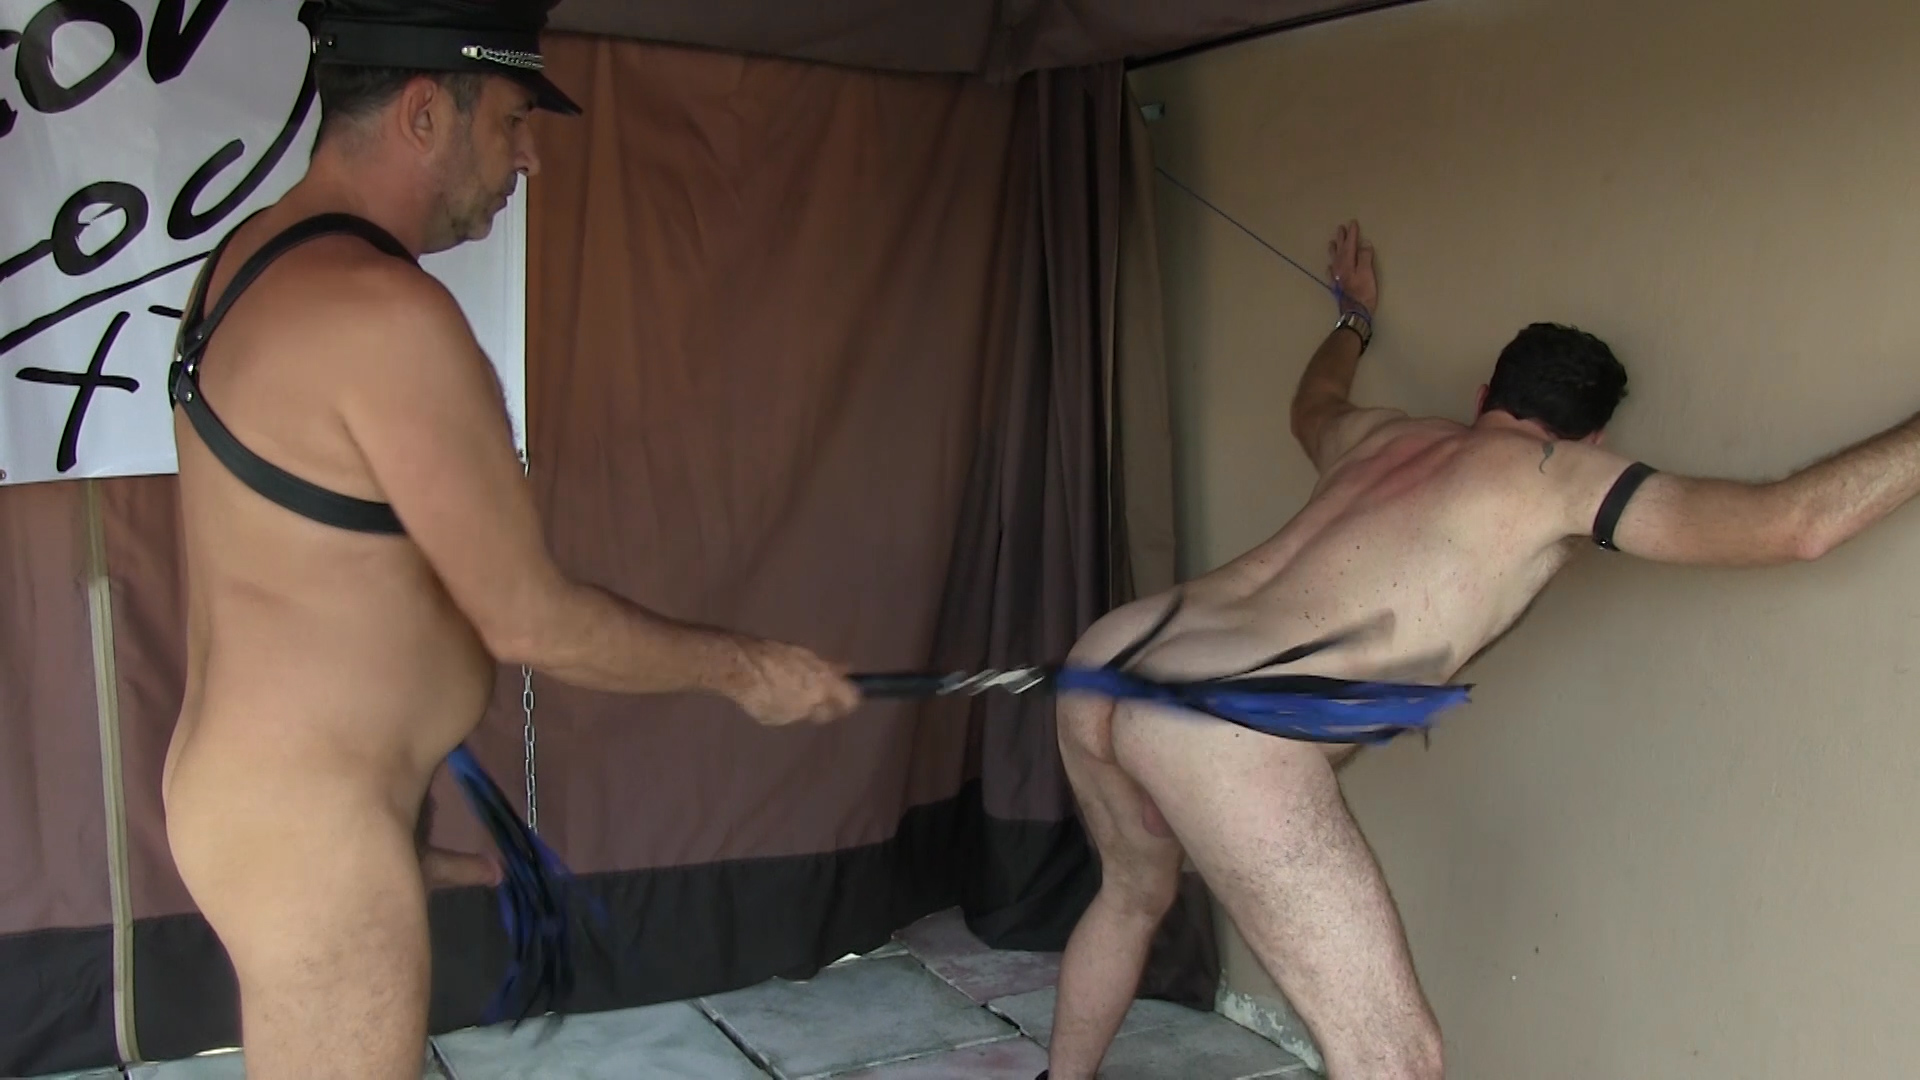 Scott Duran Flogged and Fucked Raw - VictorCodyXxx Student fucked hard gif